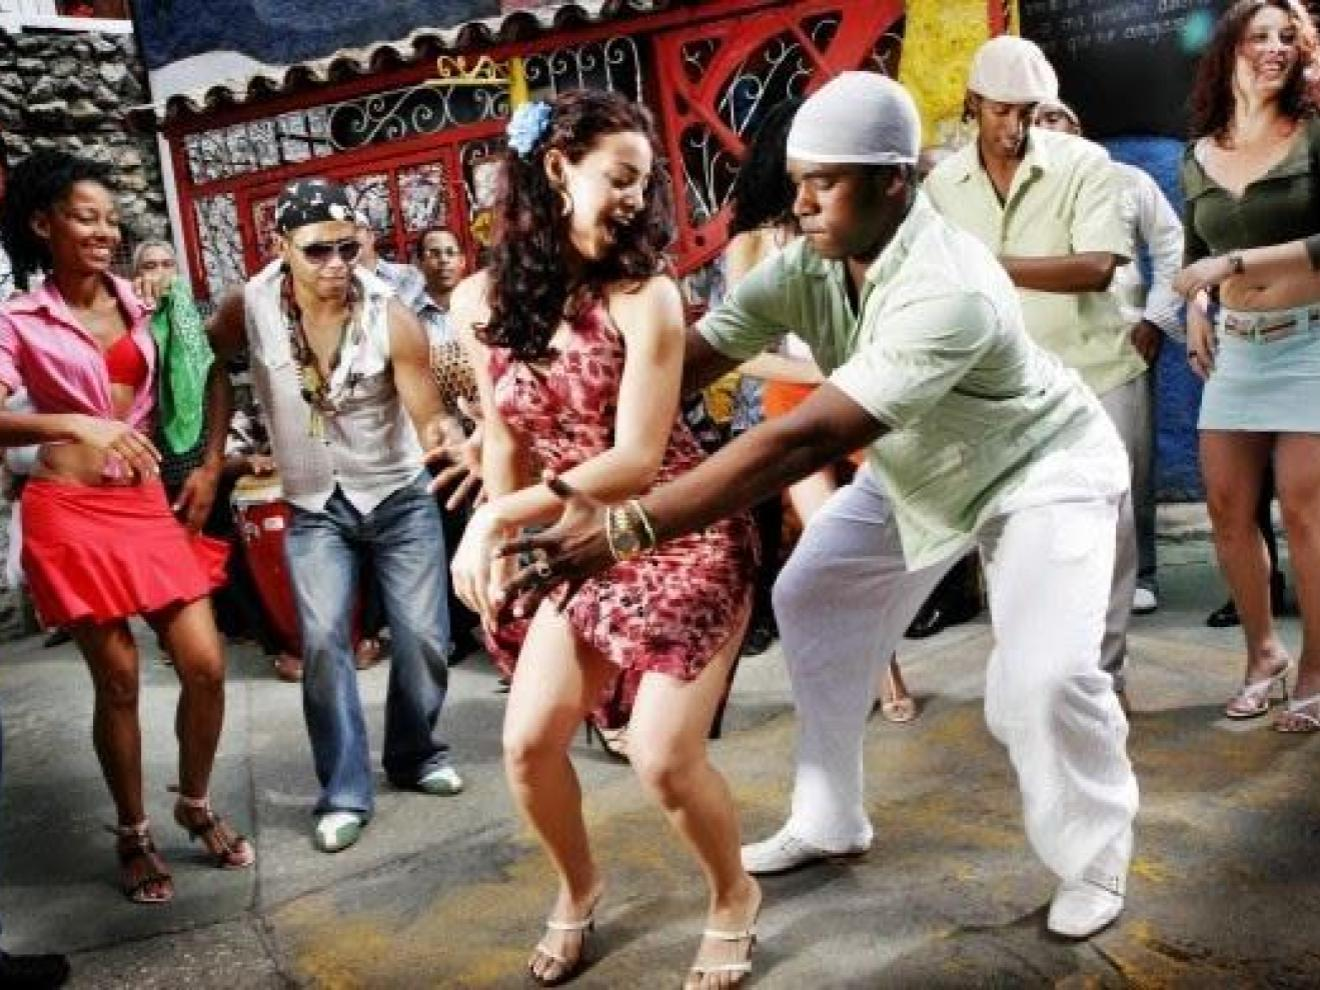 People dancing merengue